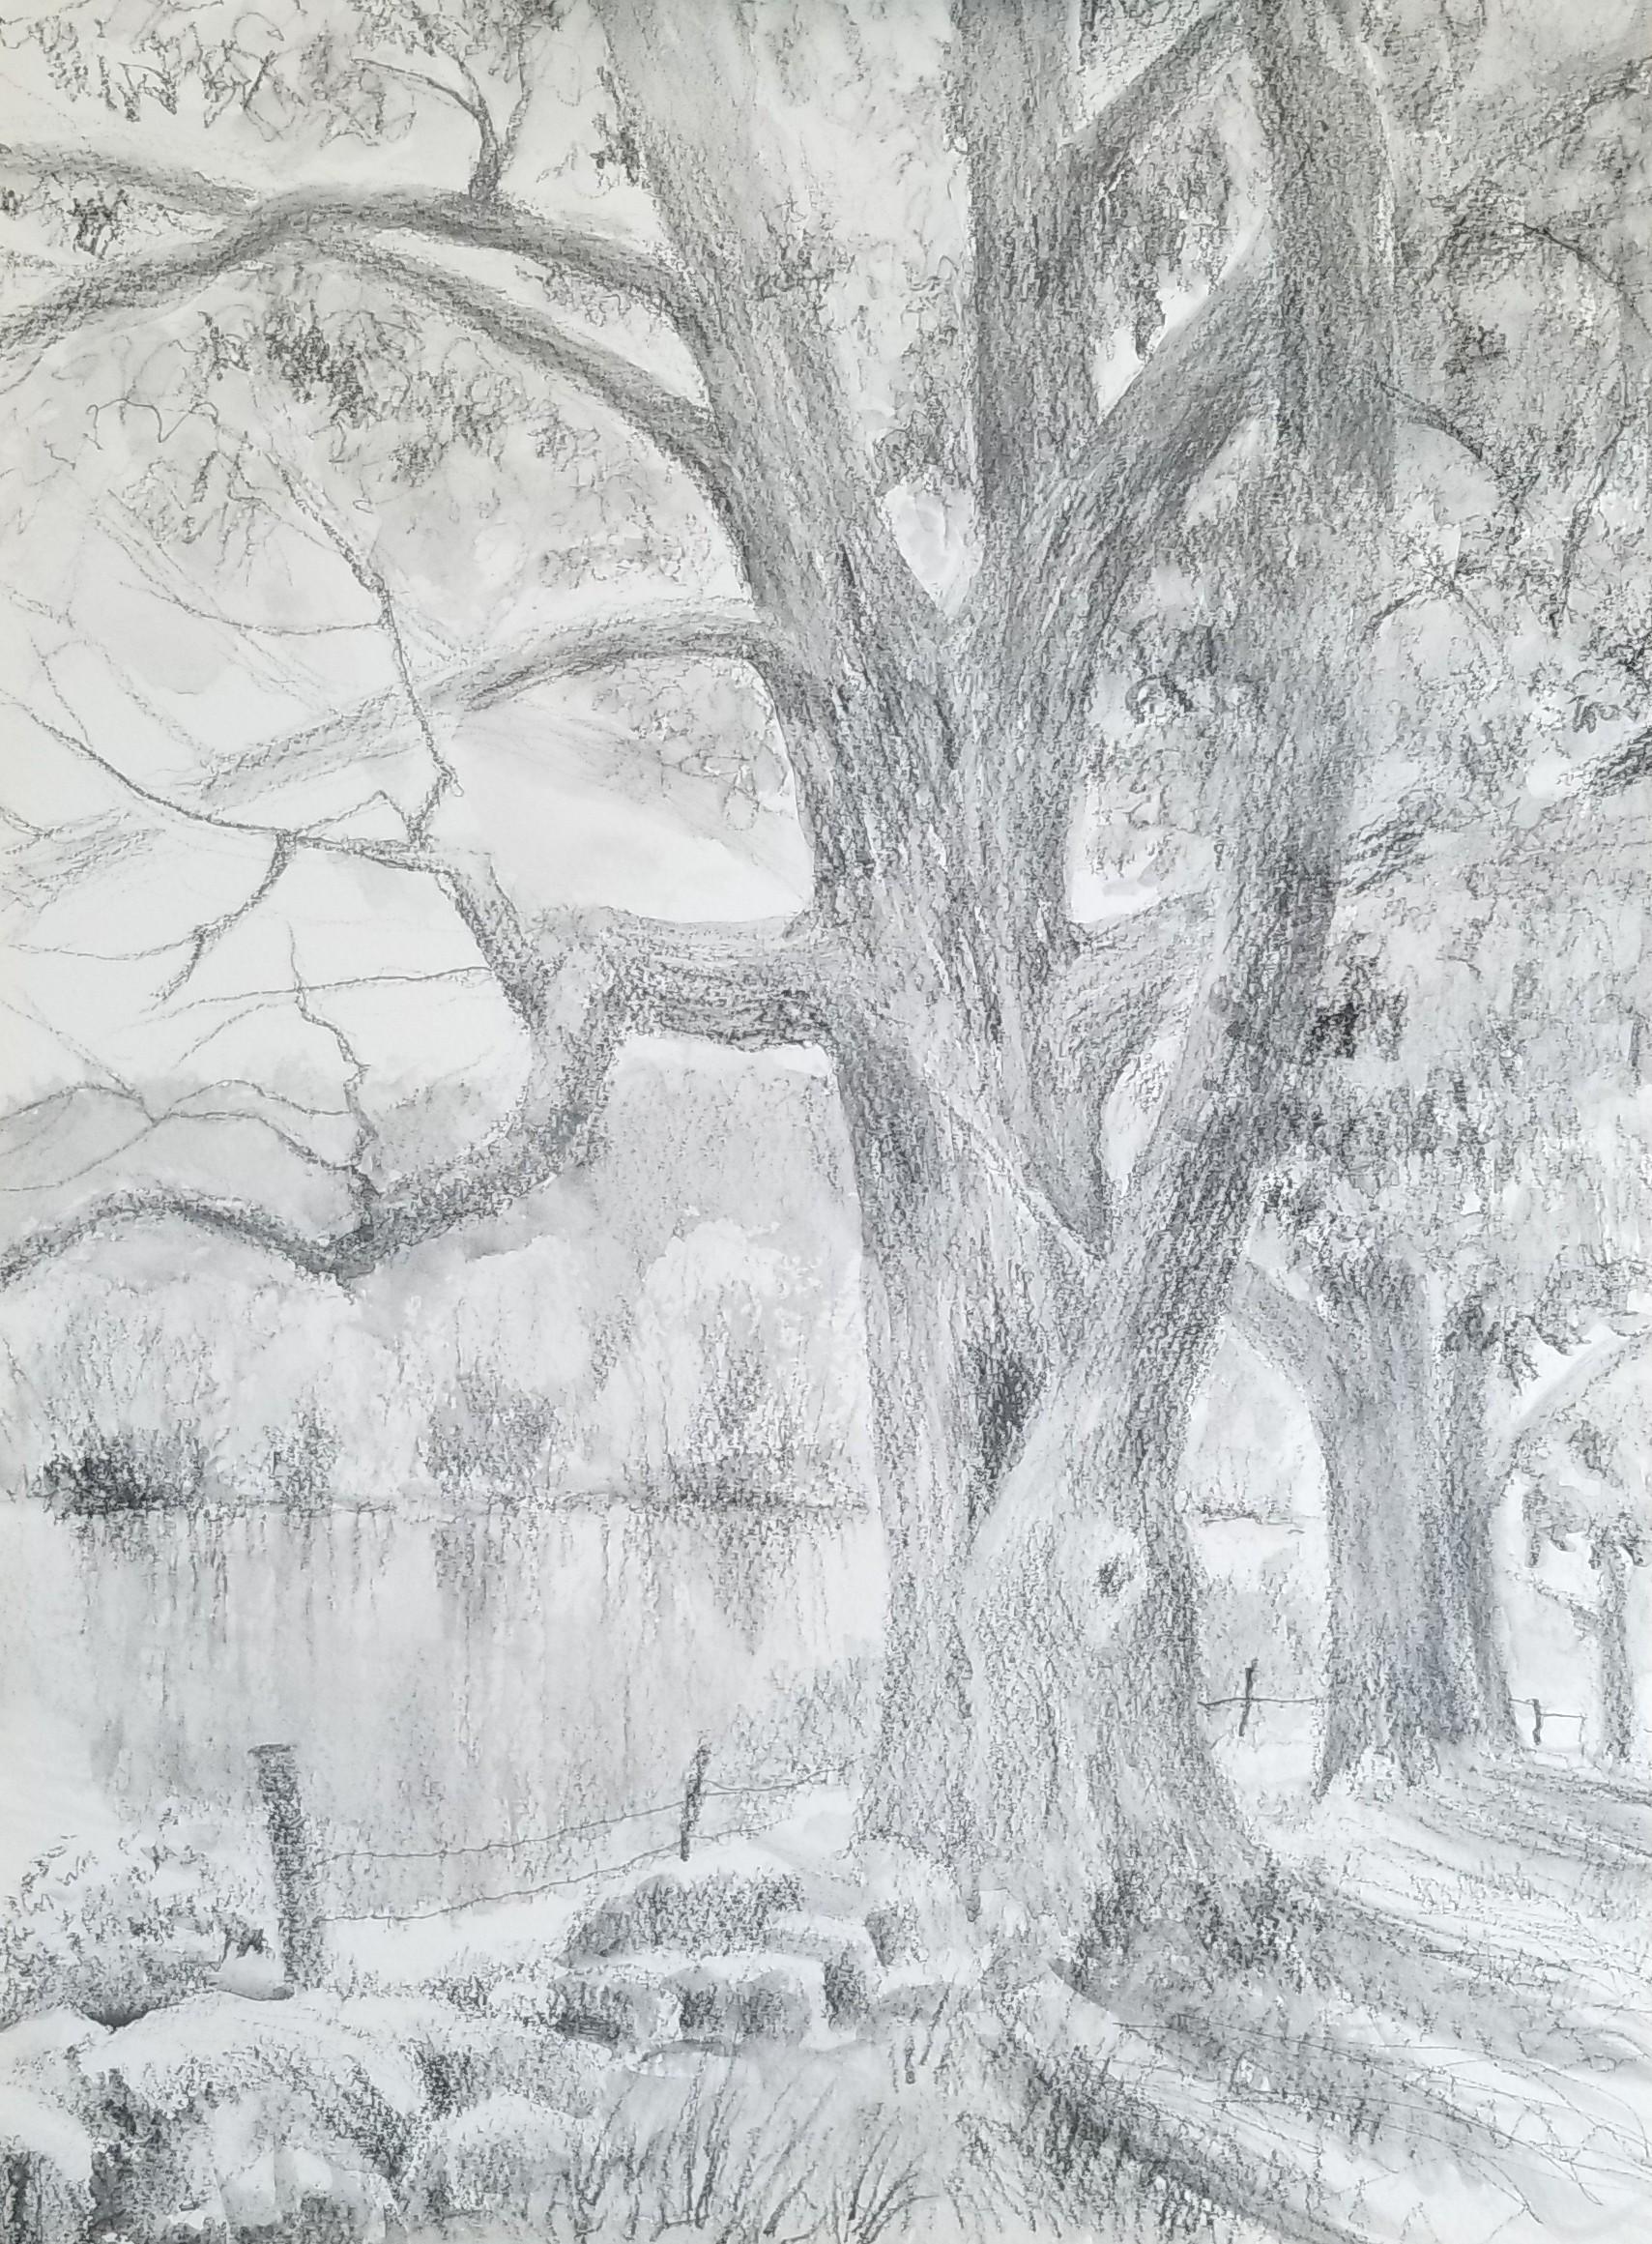 Mainstone farm view-2-pencil.jpg